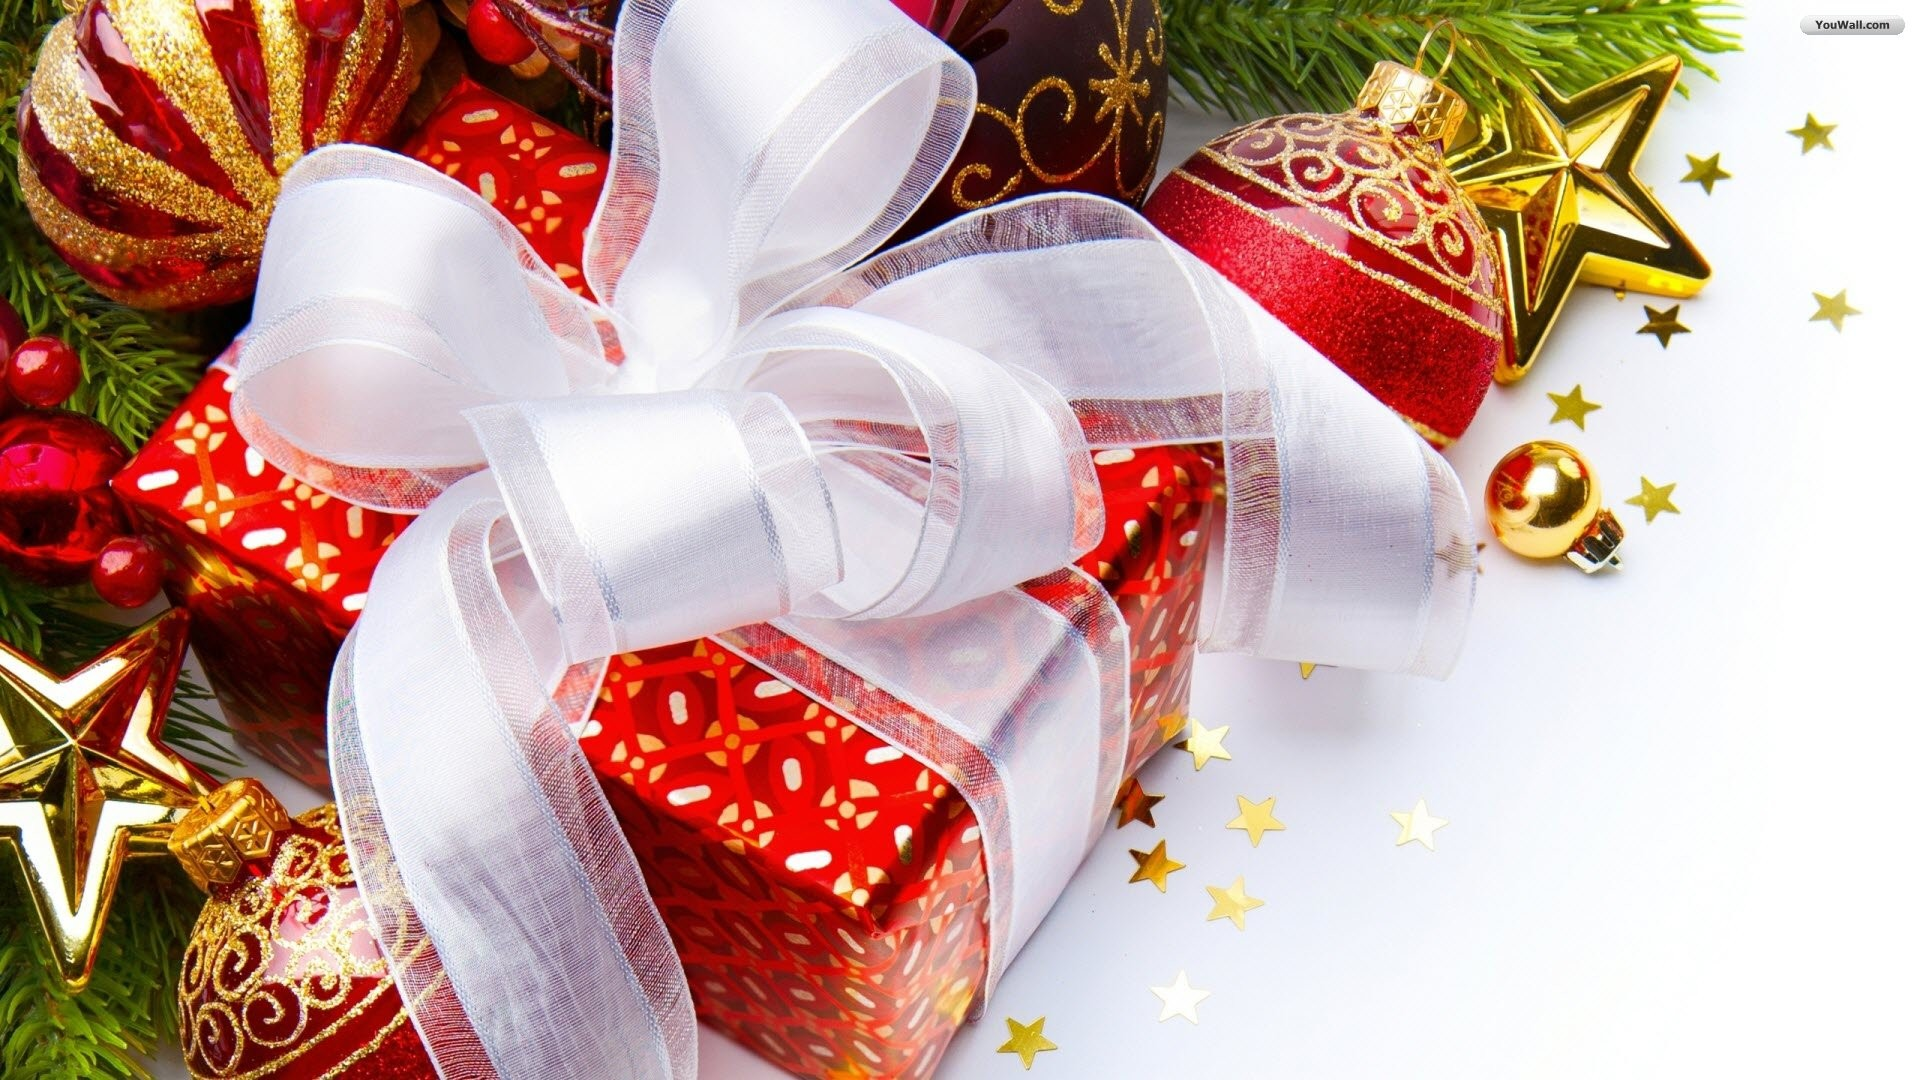 Christmas gifts Wallpaper Christmas Holidays (46 Wallpapers) – HD Wallpapers